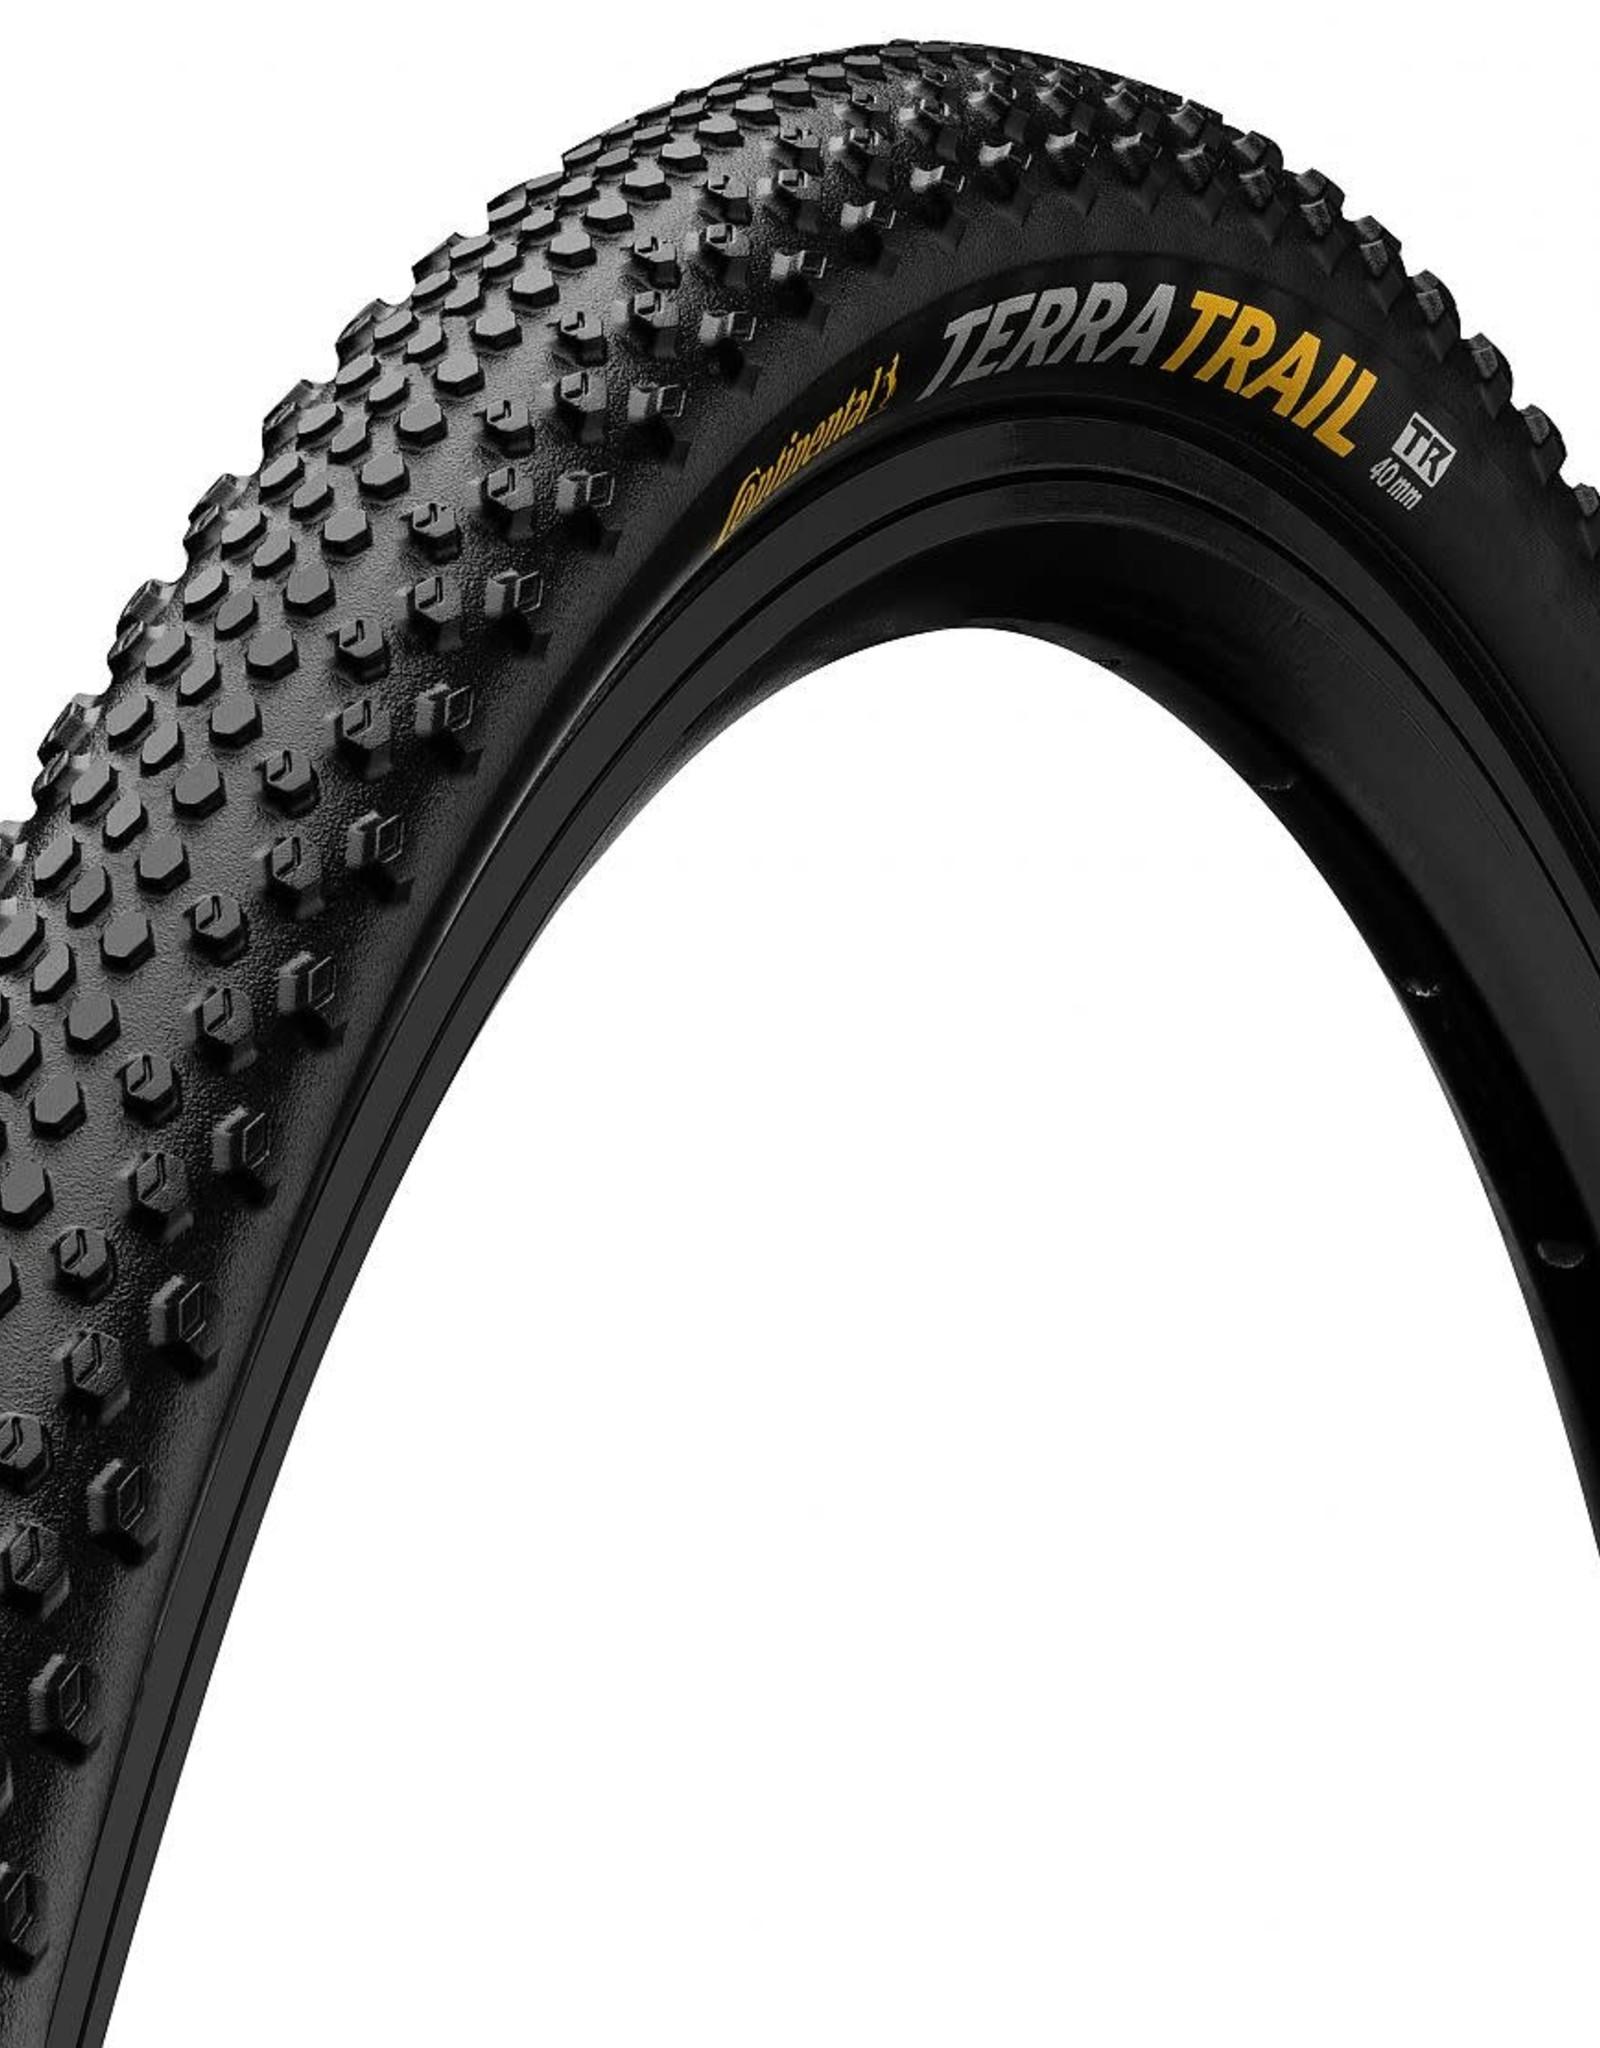 Continental - Tire - TERRA TRAIL 700x40c, ProTection TR + Black Chili